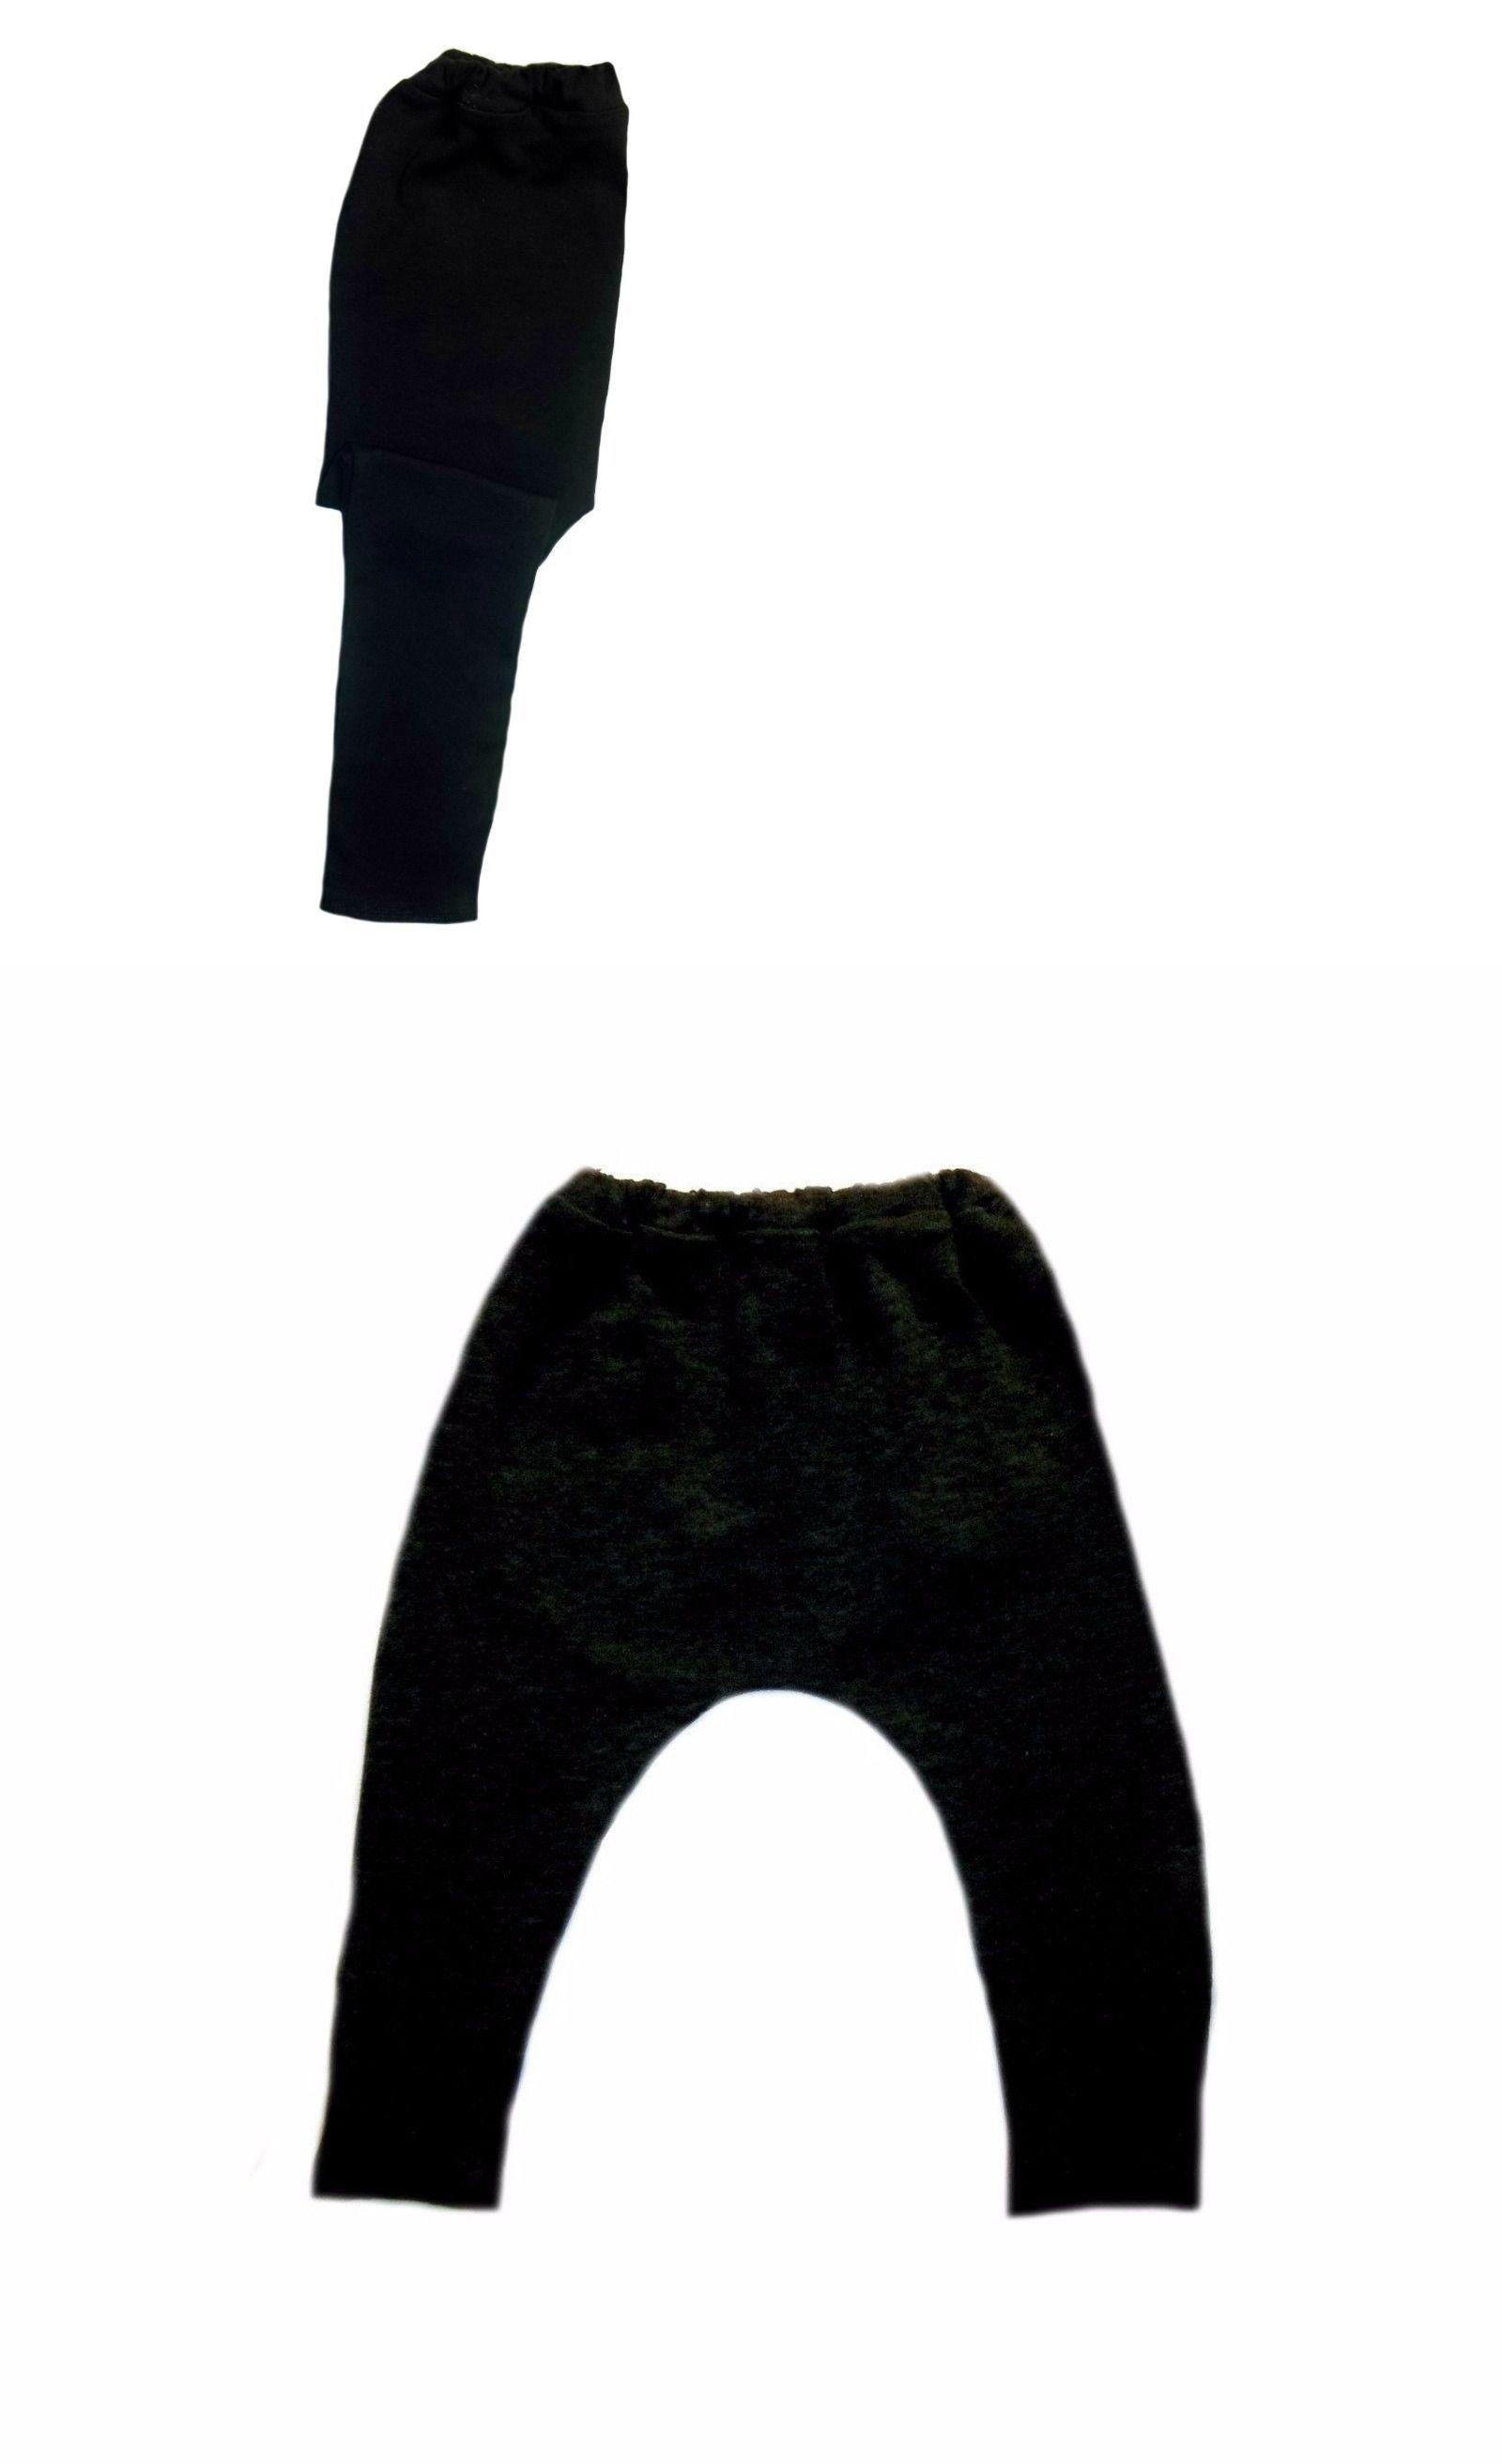 White Unisex Baby Leggings 6 Preemie Newborn and Toddler Pants Sizes